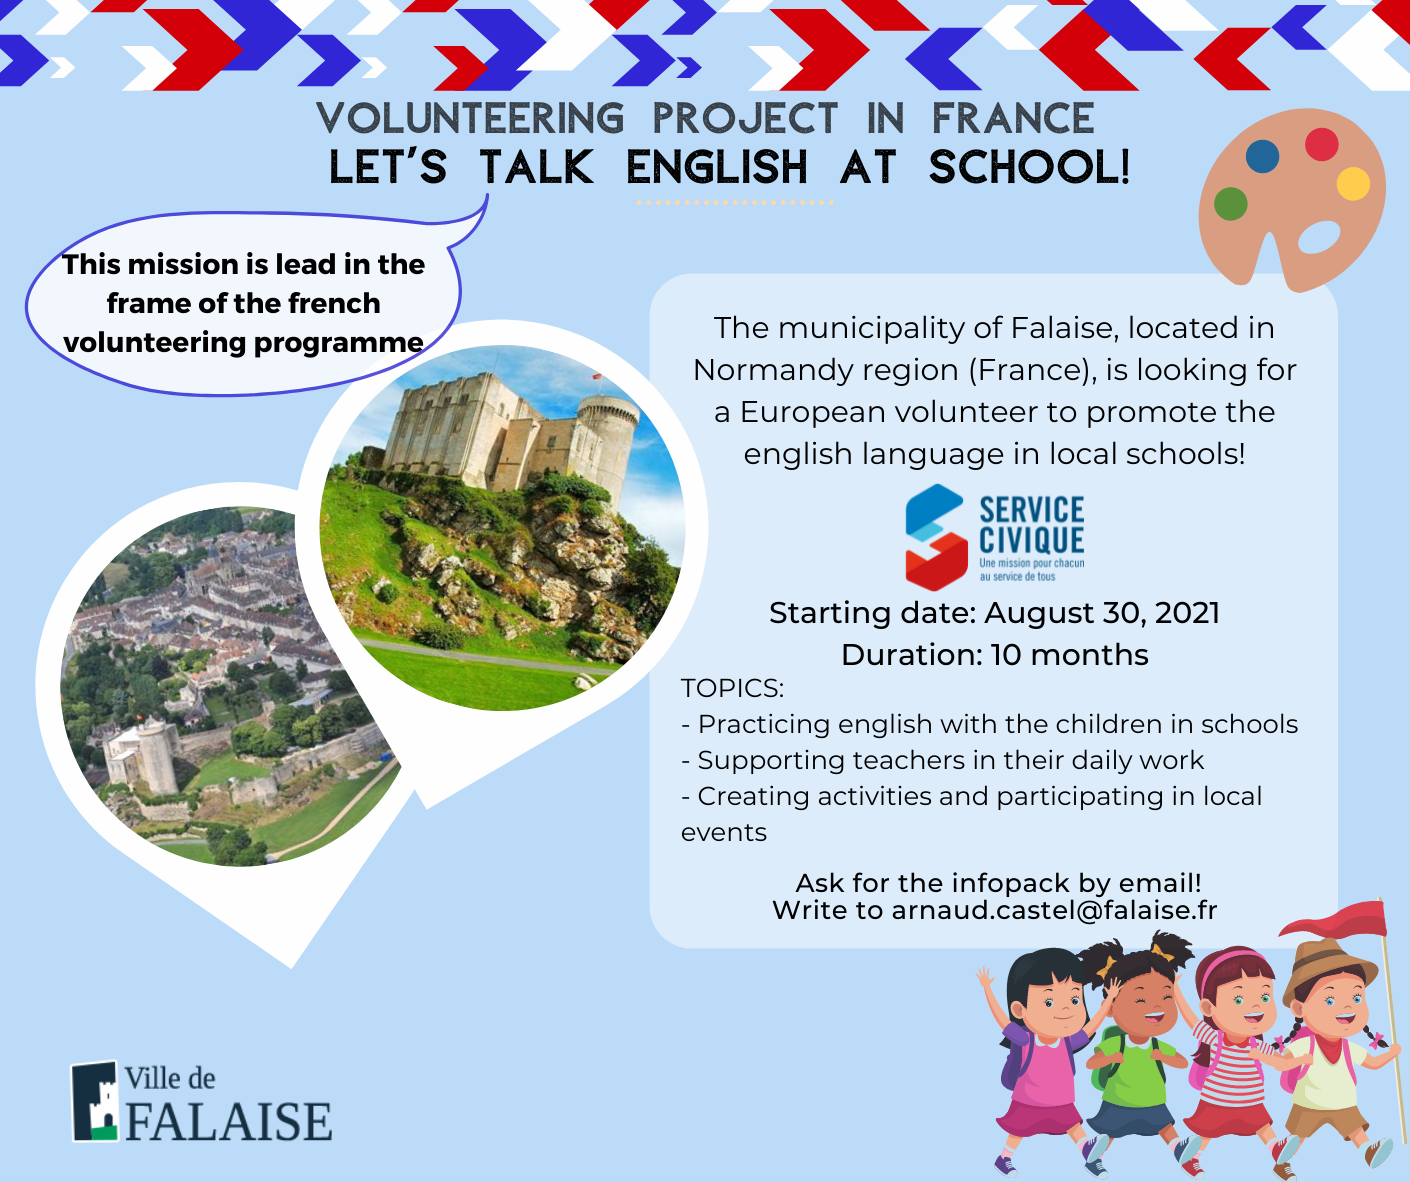 """Let's speak English at school!"": Service Civique in Francia"